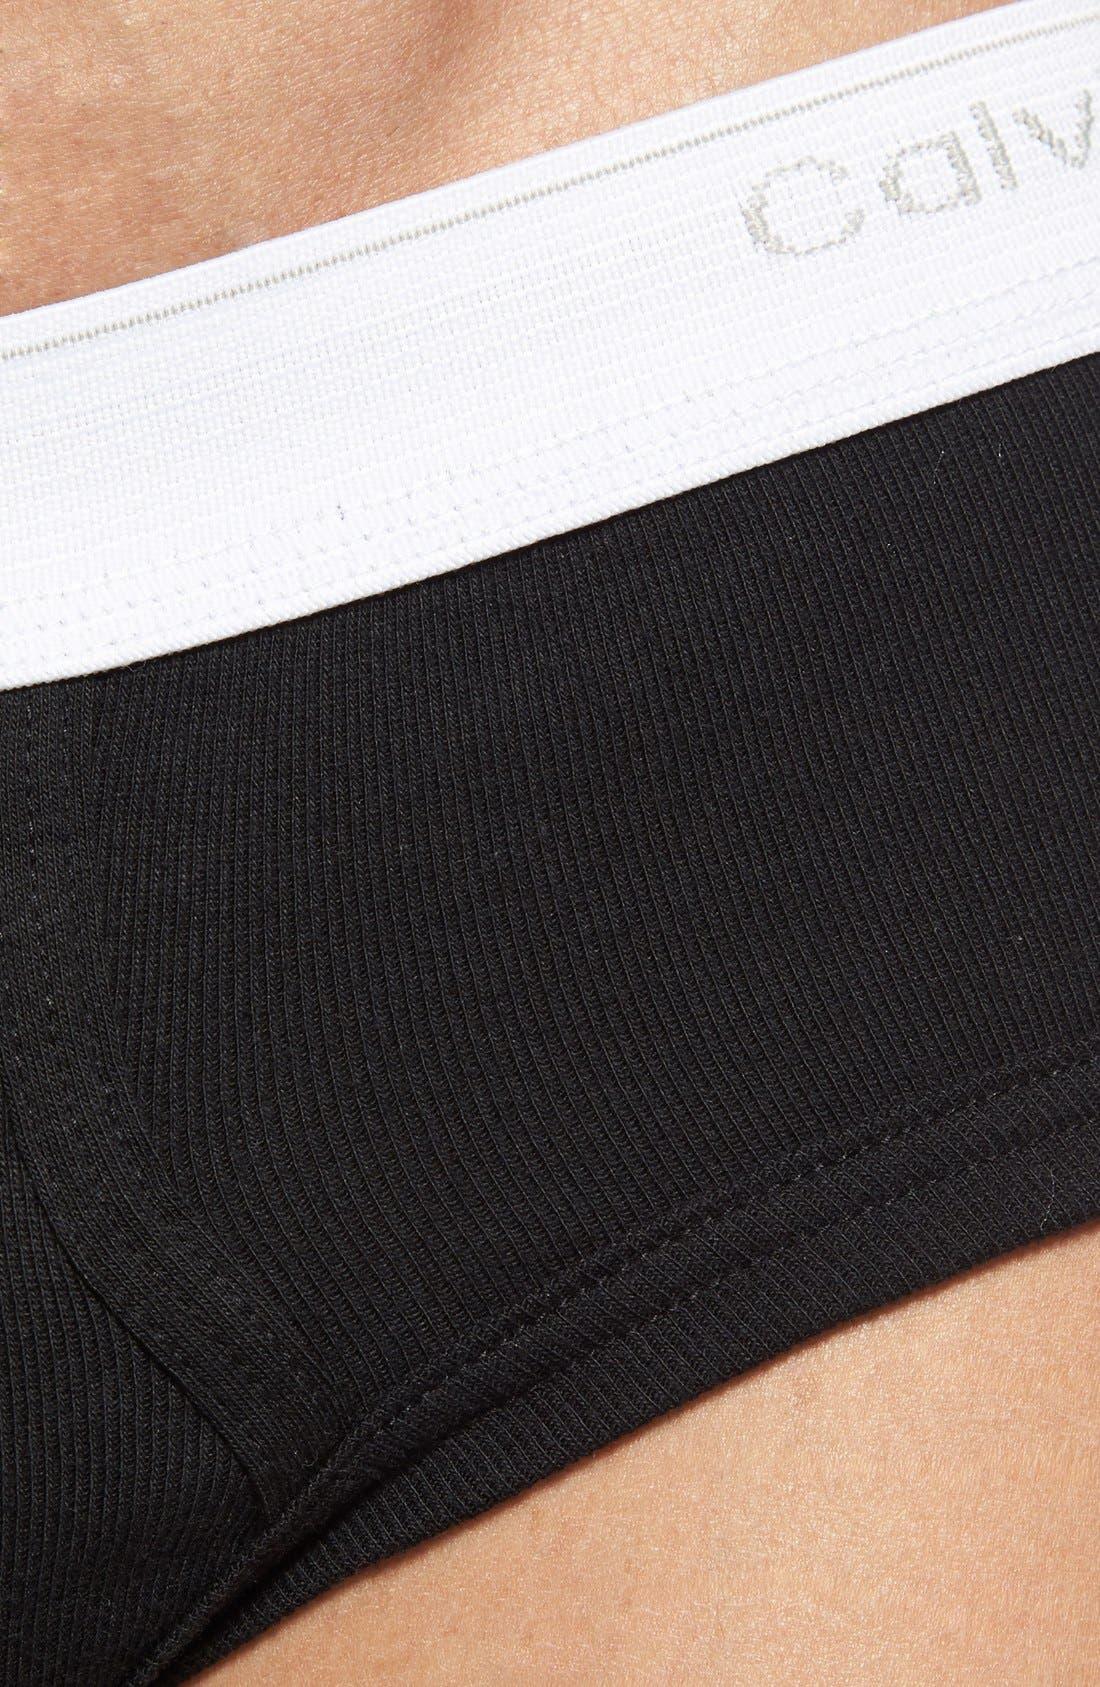 Alternate Image 3  - Calvin Klein 'U1183' Low Rise Cotton Briefs (3-Pack)